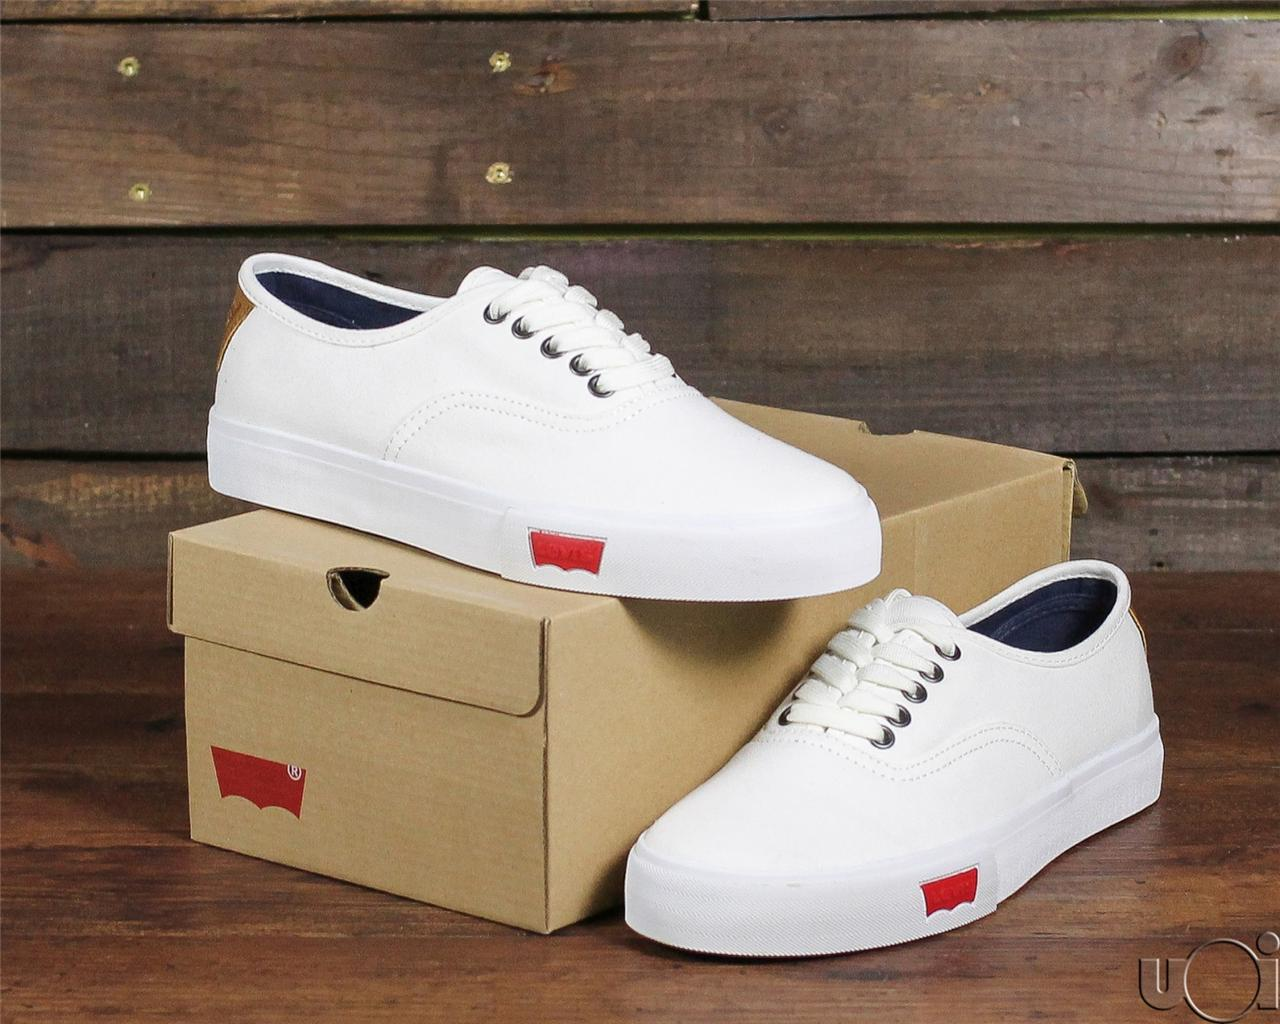 new 2013 levis footwear jordy low top canvas shoe icy snow